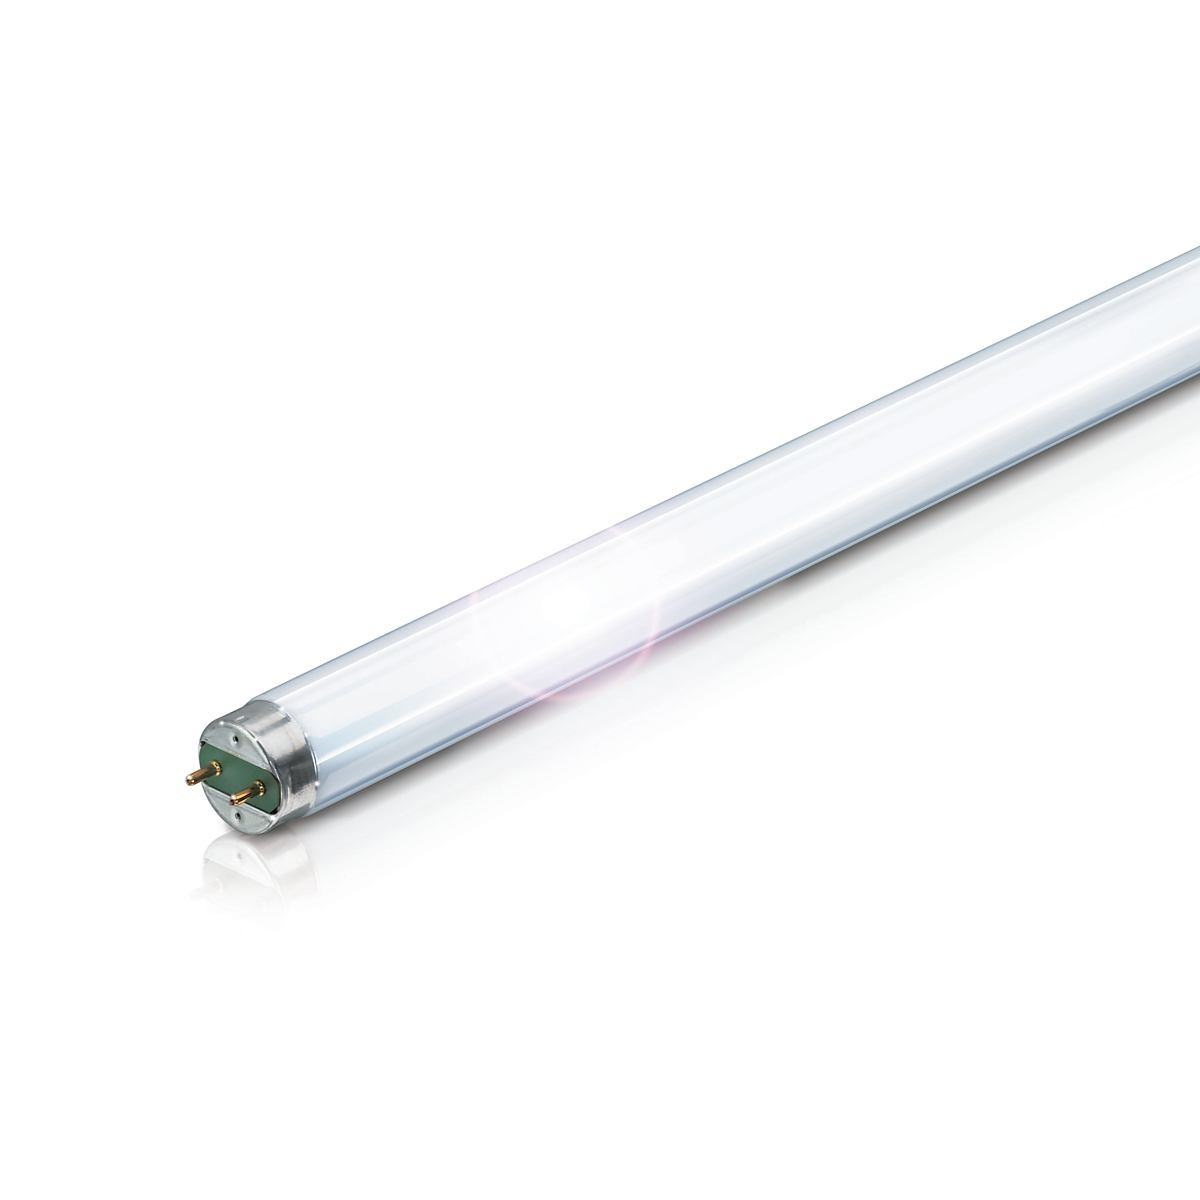 tl lamp 18 w 60 cm kleur 830 warm wit